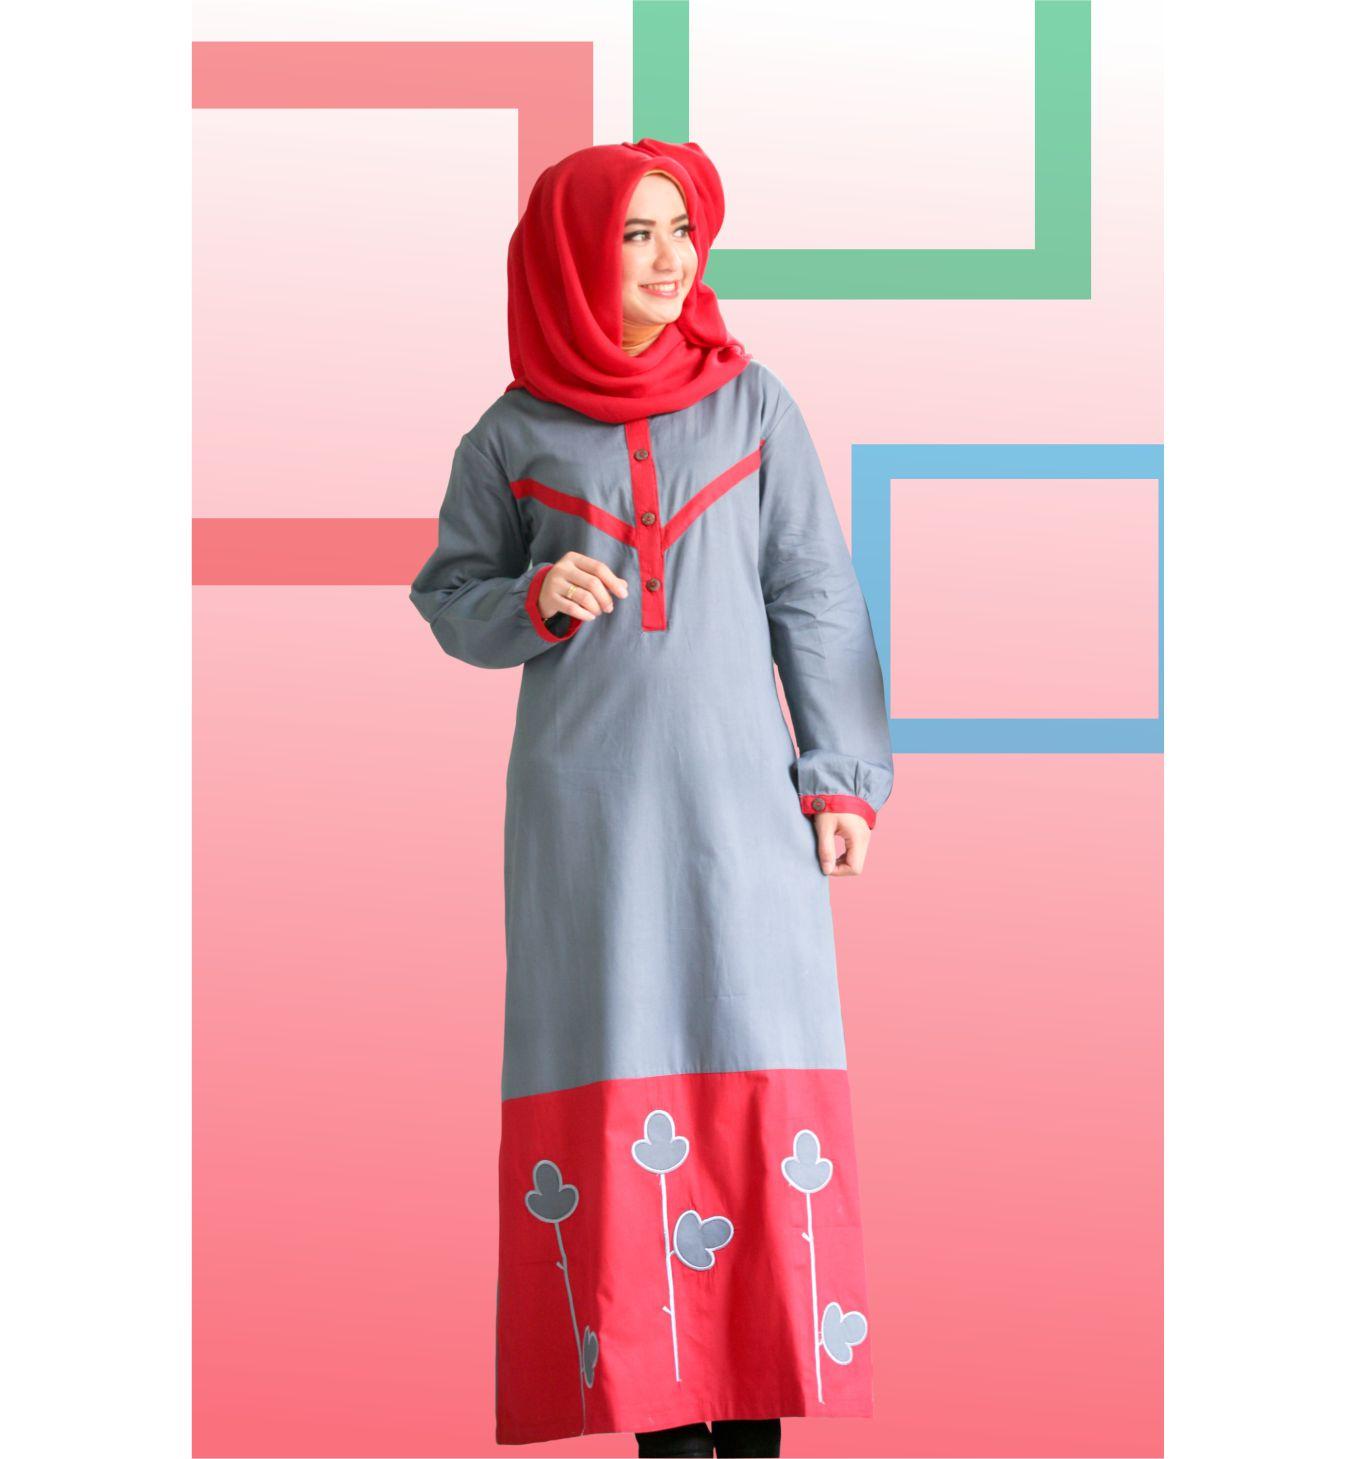 Jual Baju Gamis Katun Twill Murah Nibras NB 41 Abu Tua Merah Size